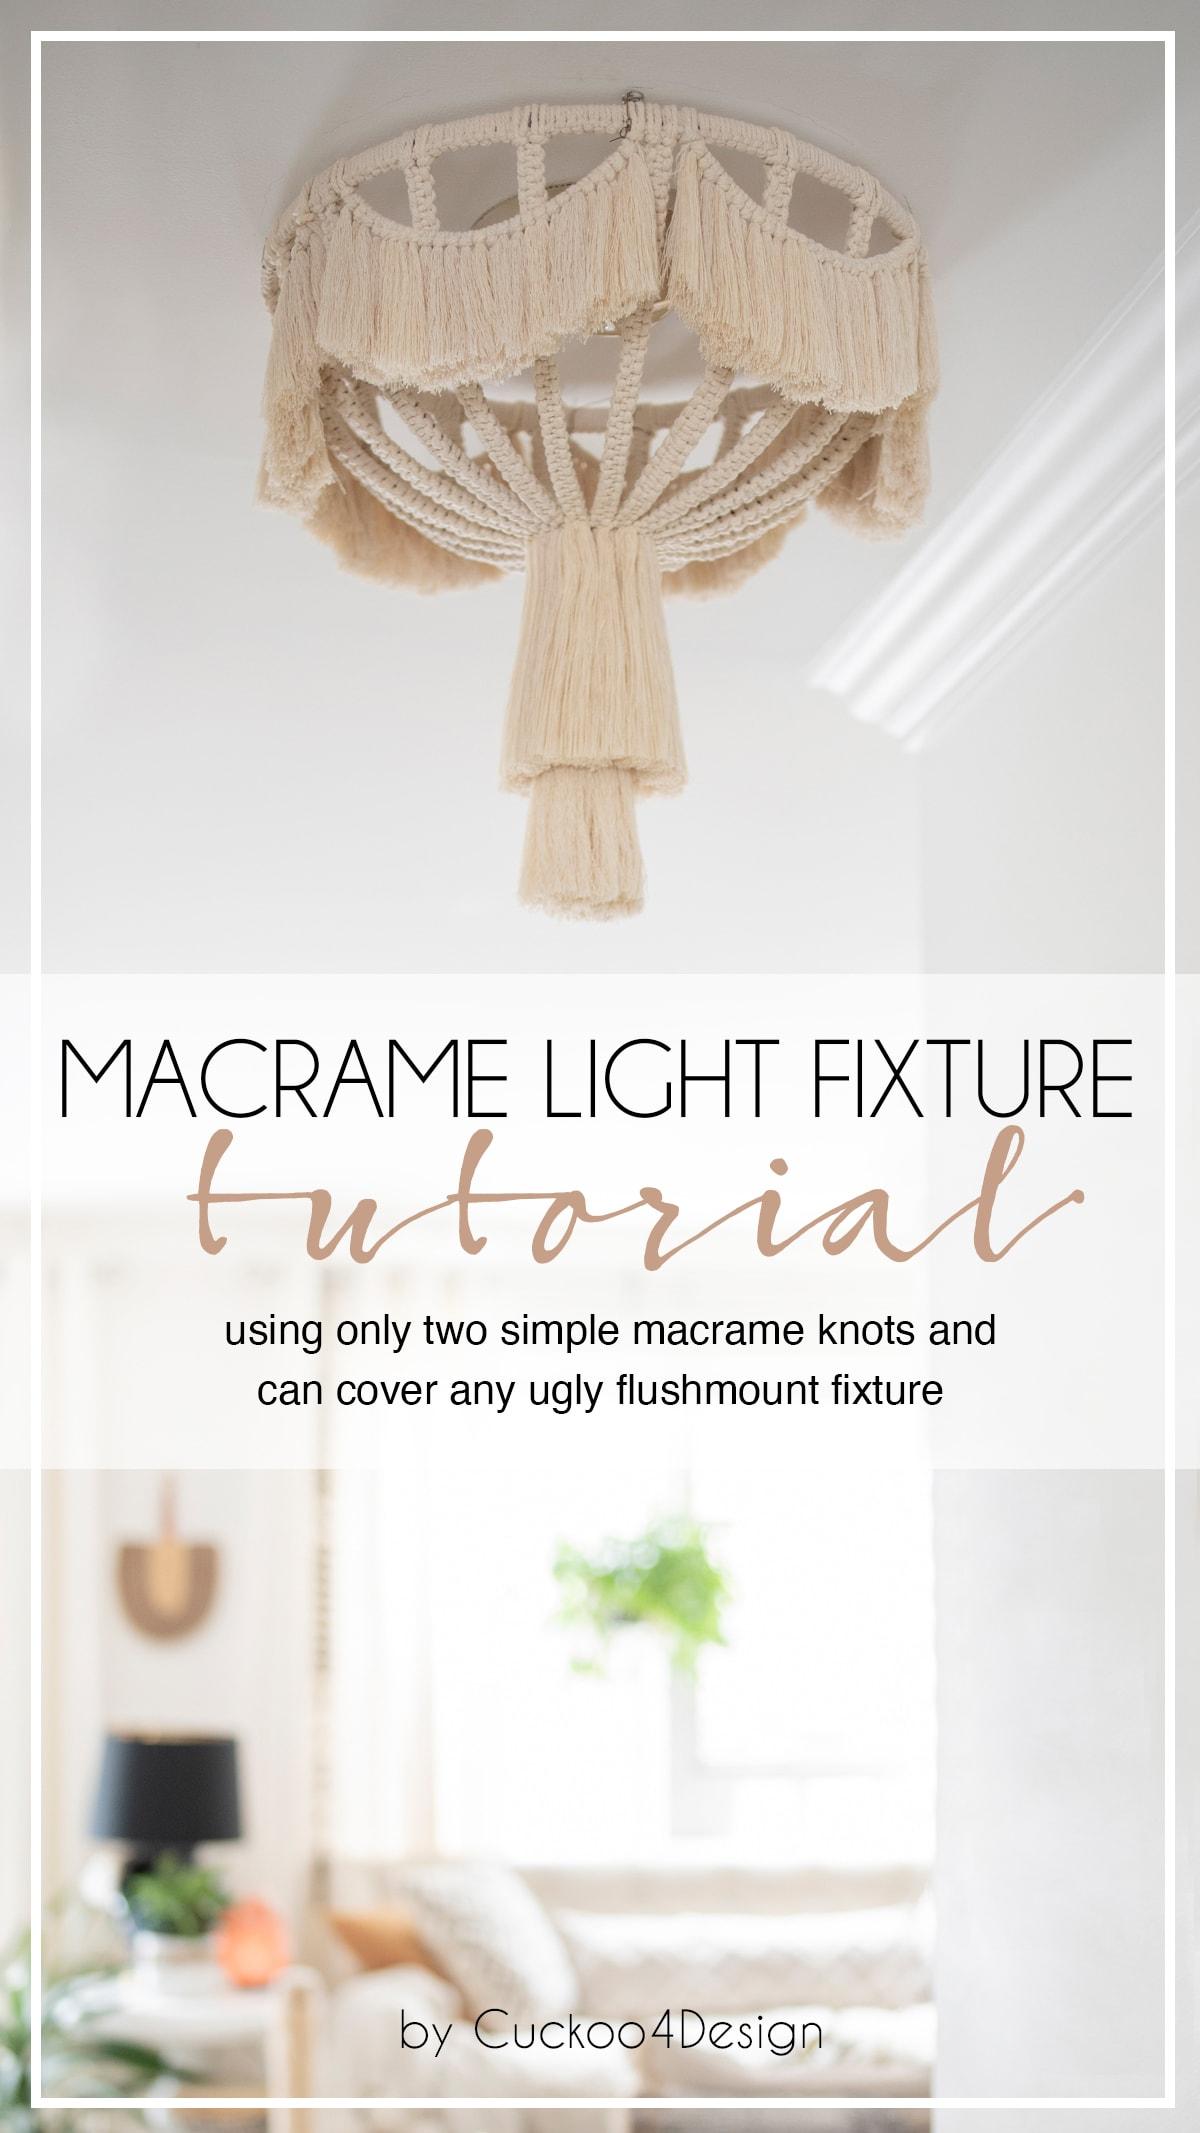 DIY flush mount macrame light fixture